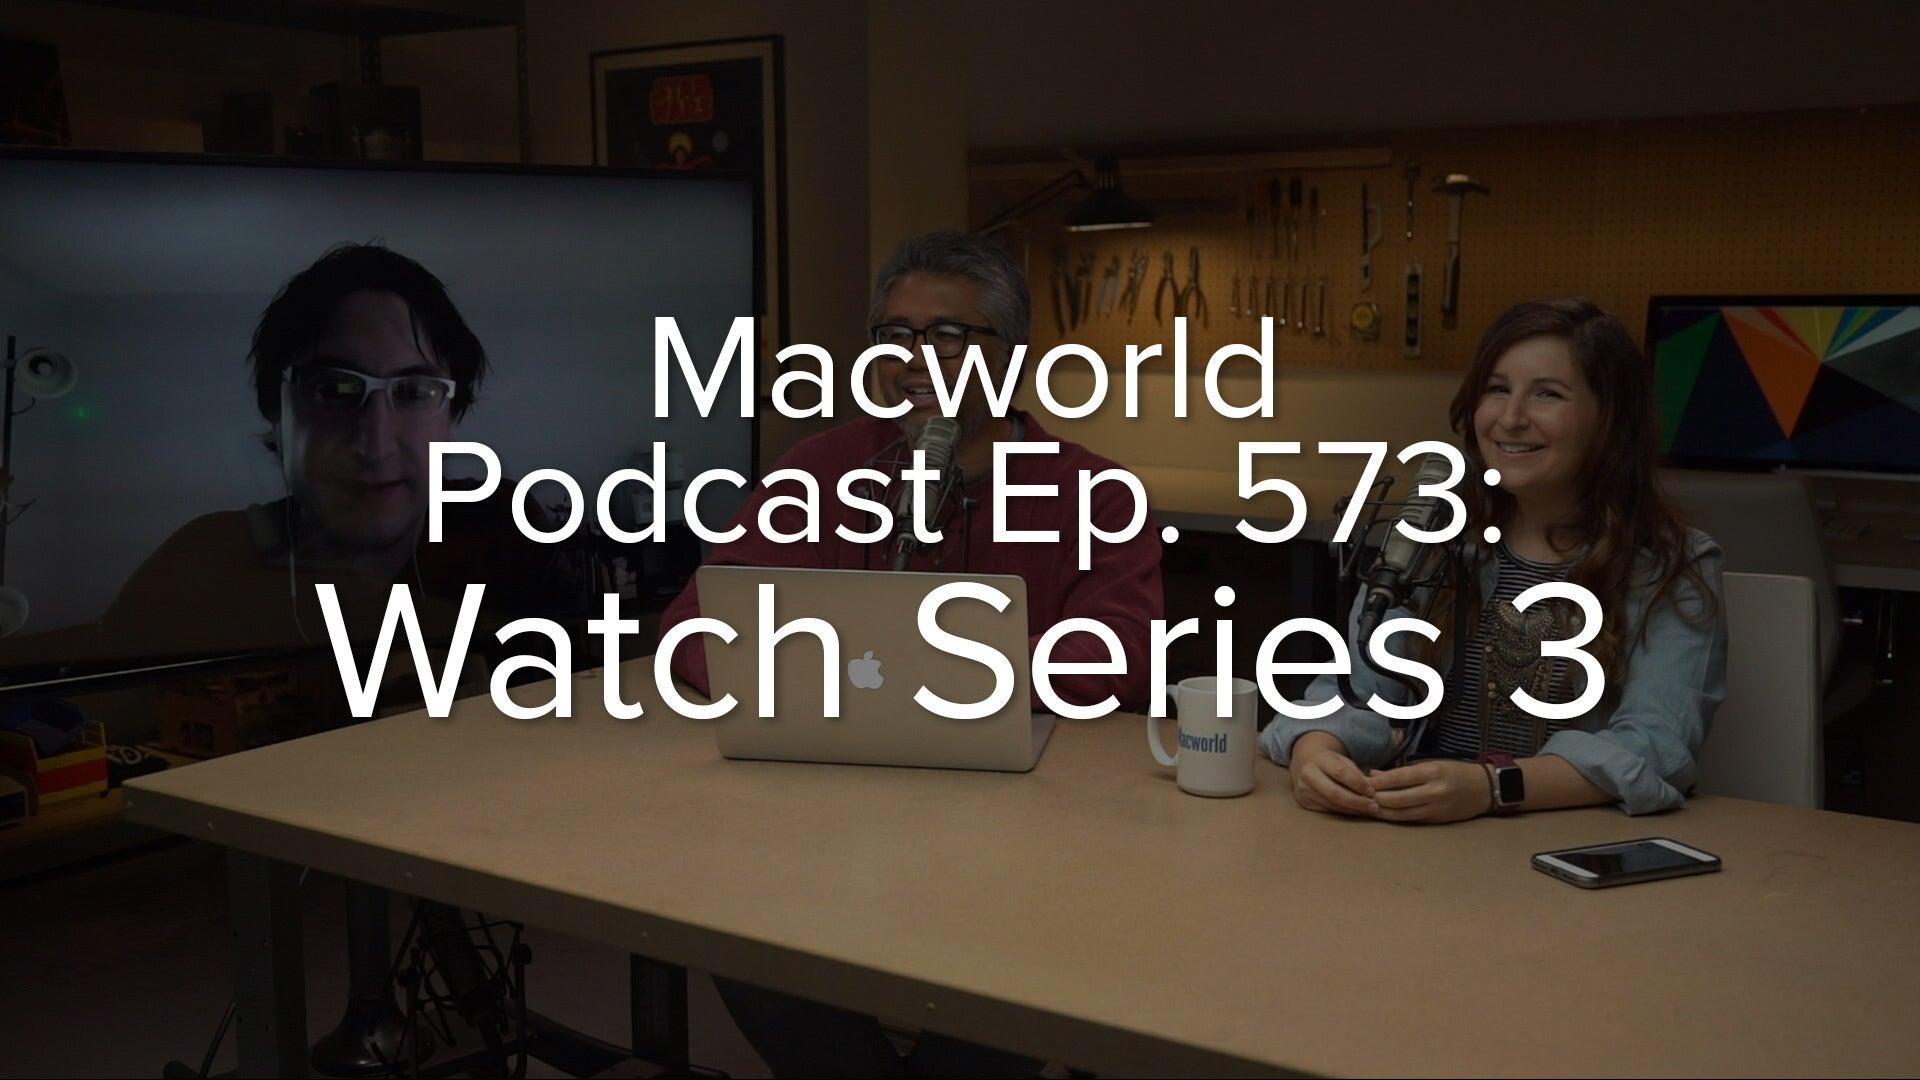 Macworld Podcast episode 573: Apple Watch Series 3